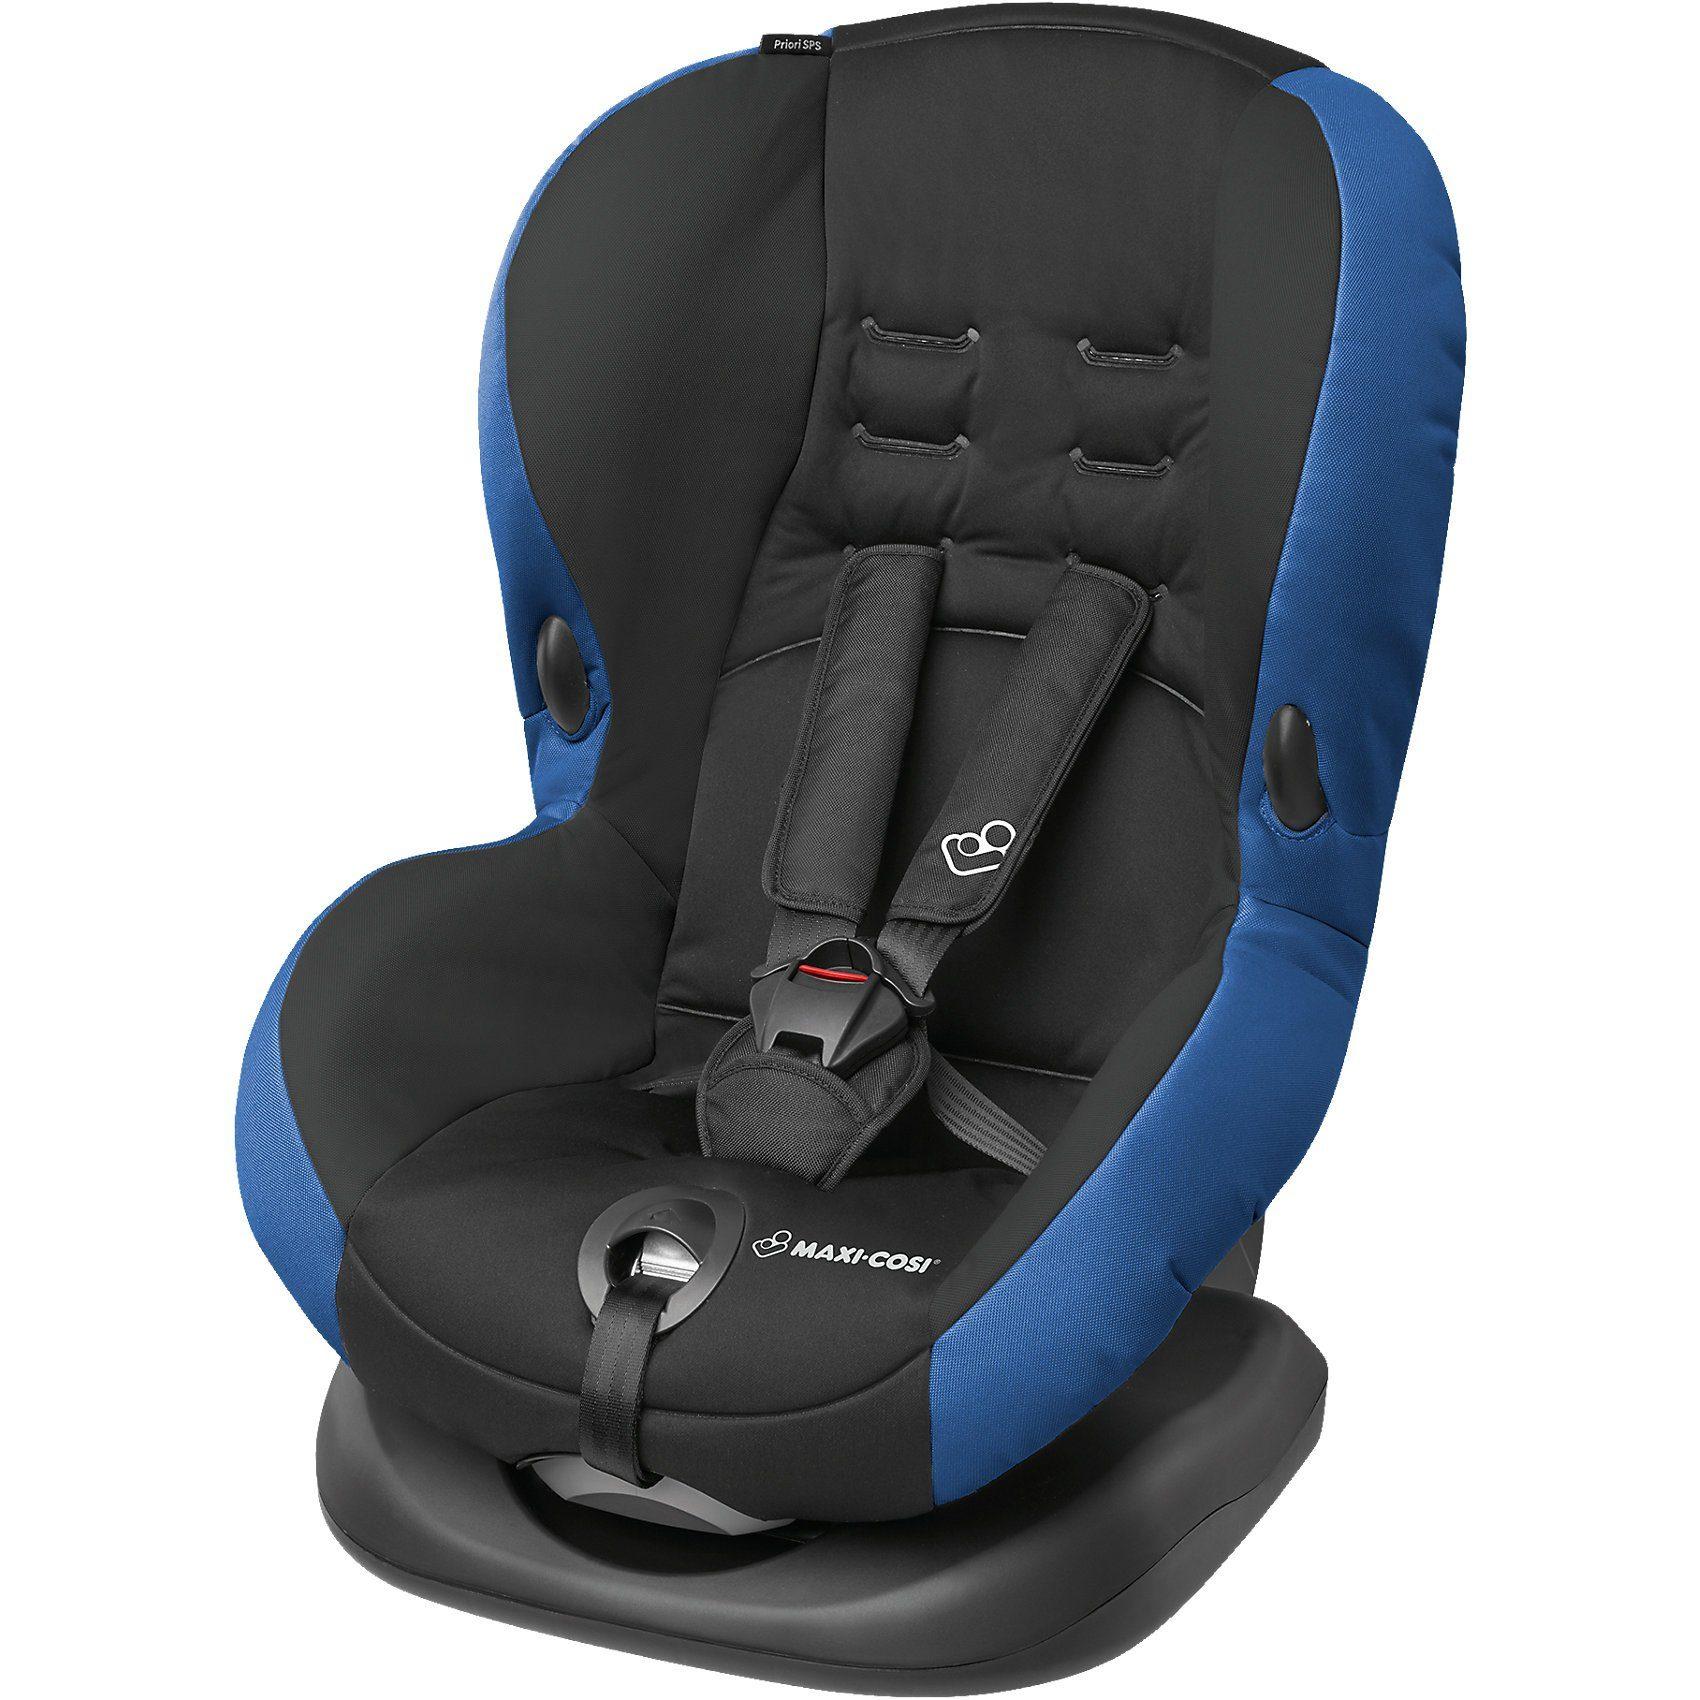 Maxi-Cosi Auto-Kindersitz Priori SPS+, Navy Black, 2017